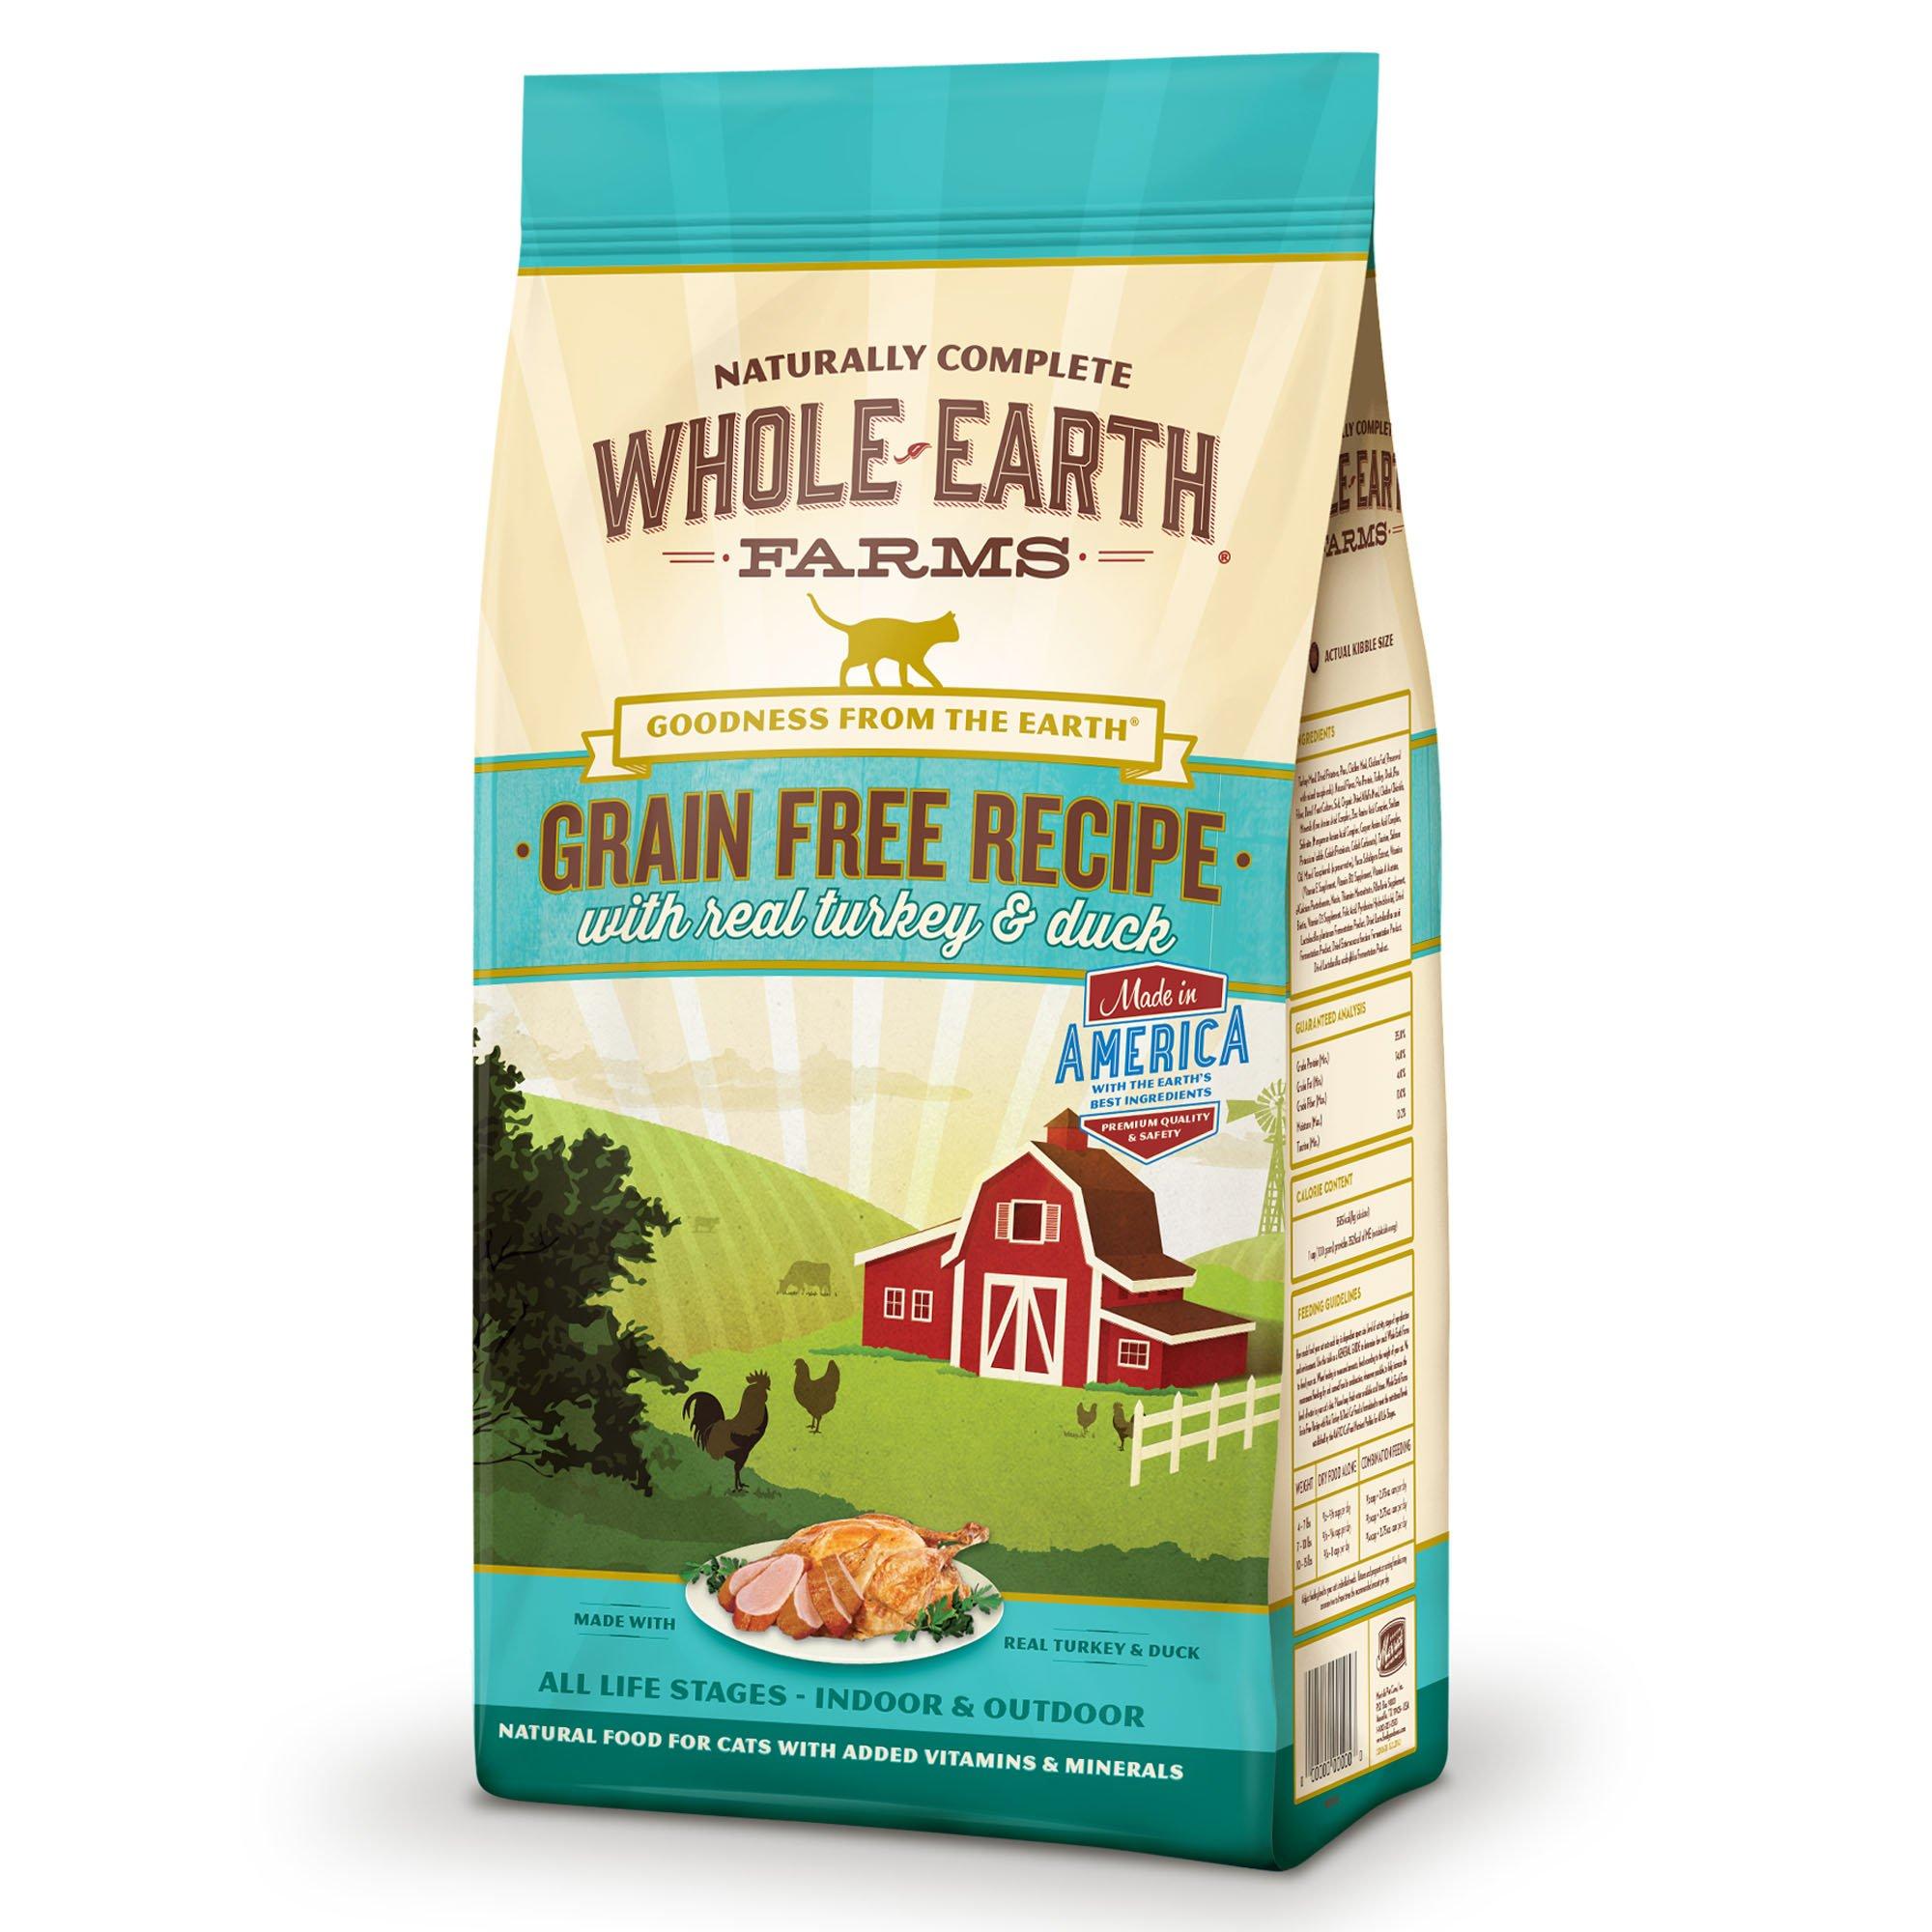 Whole-Earth-Farms-Grain-Free-Real-Turkey-amp-Duck-Cat-Food thumbnail 21